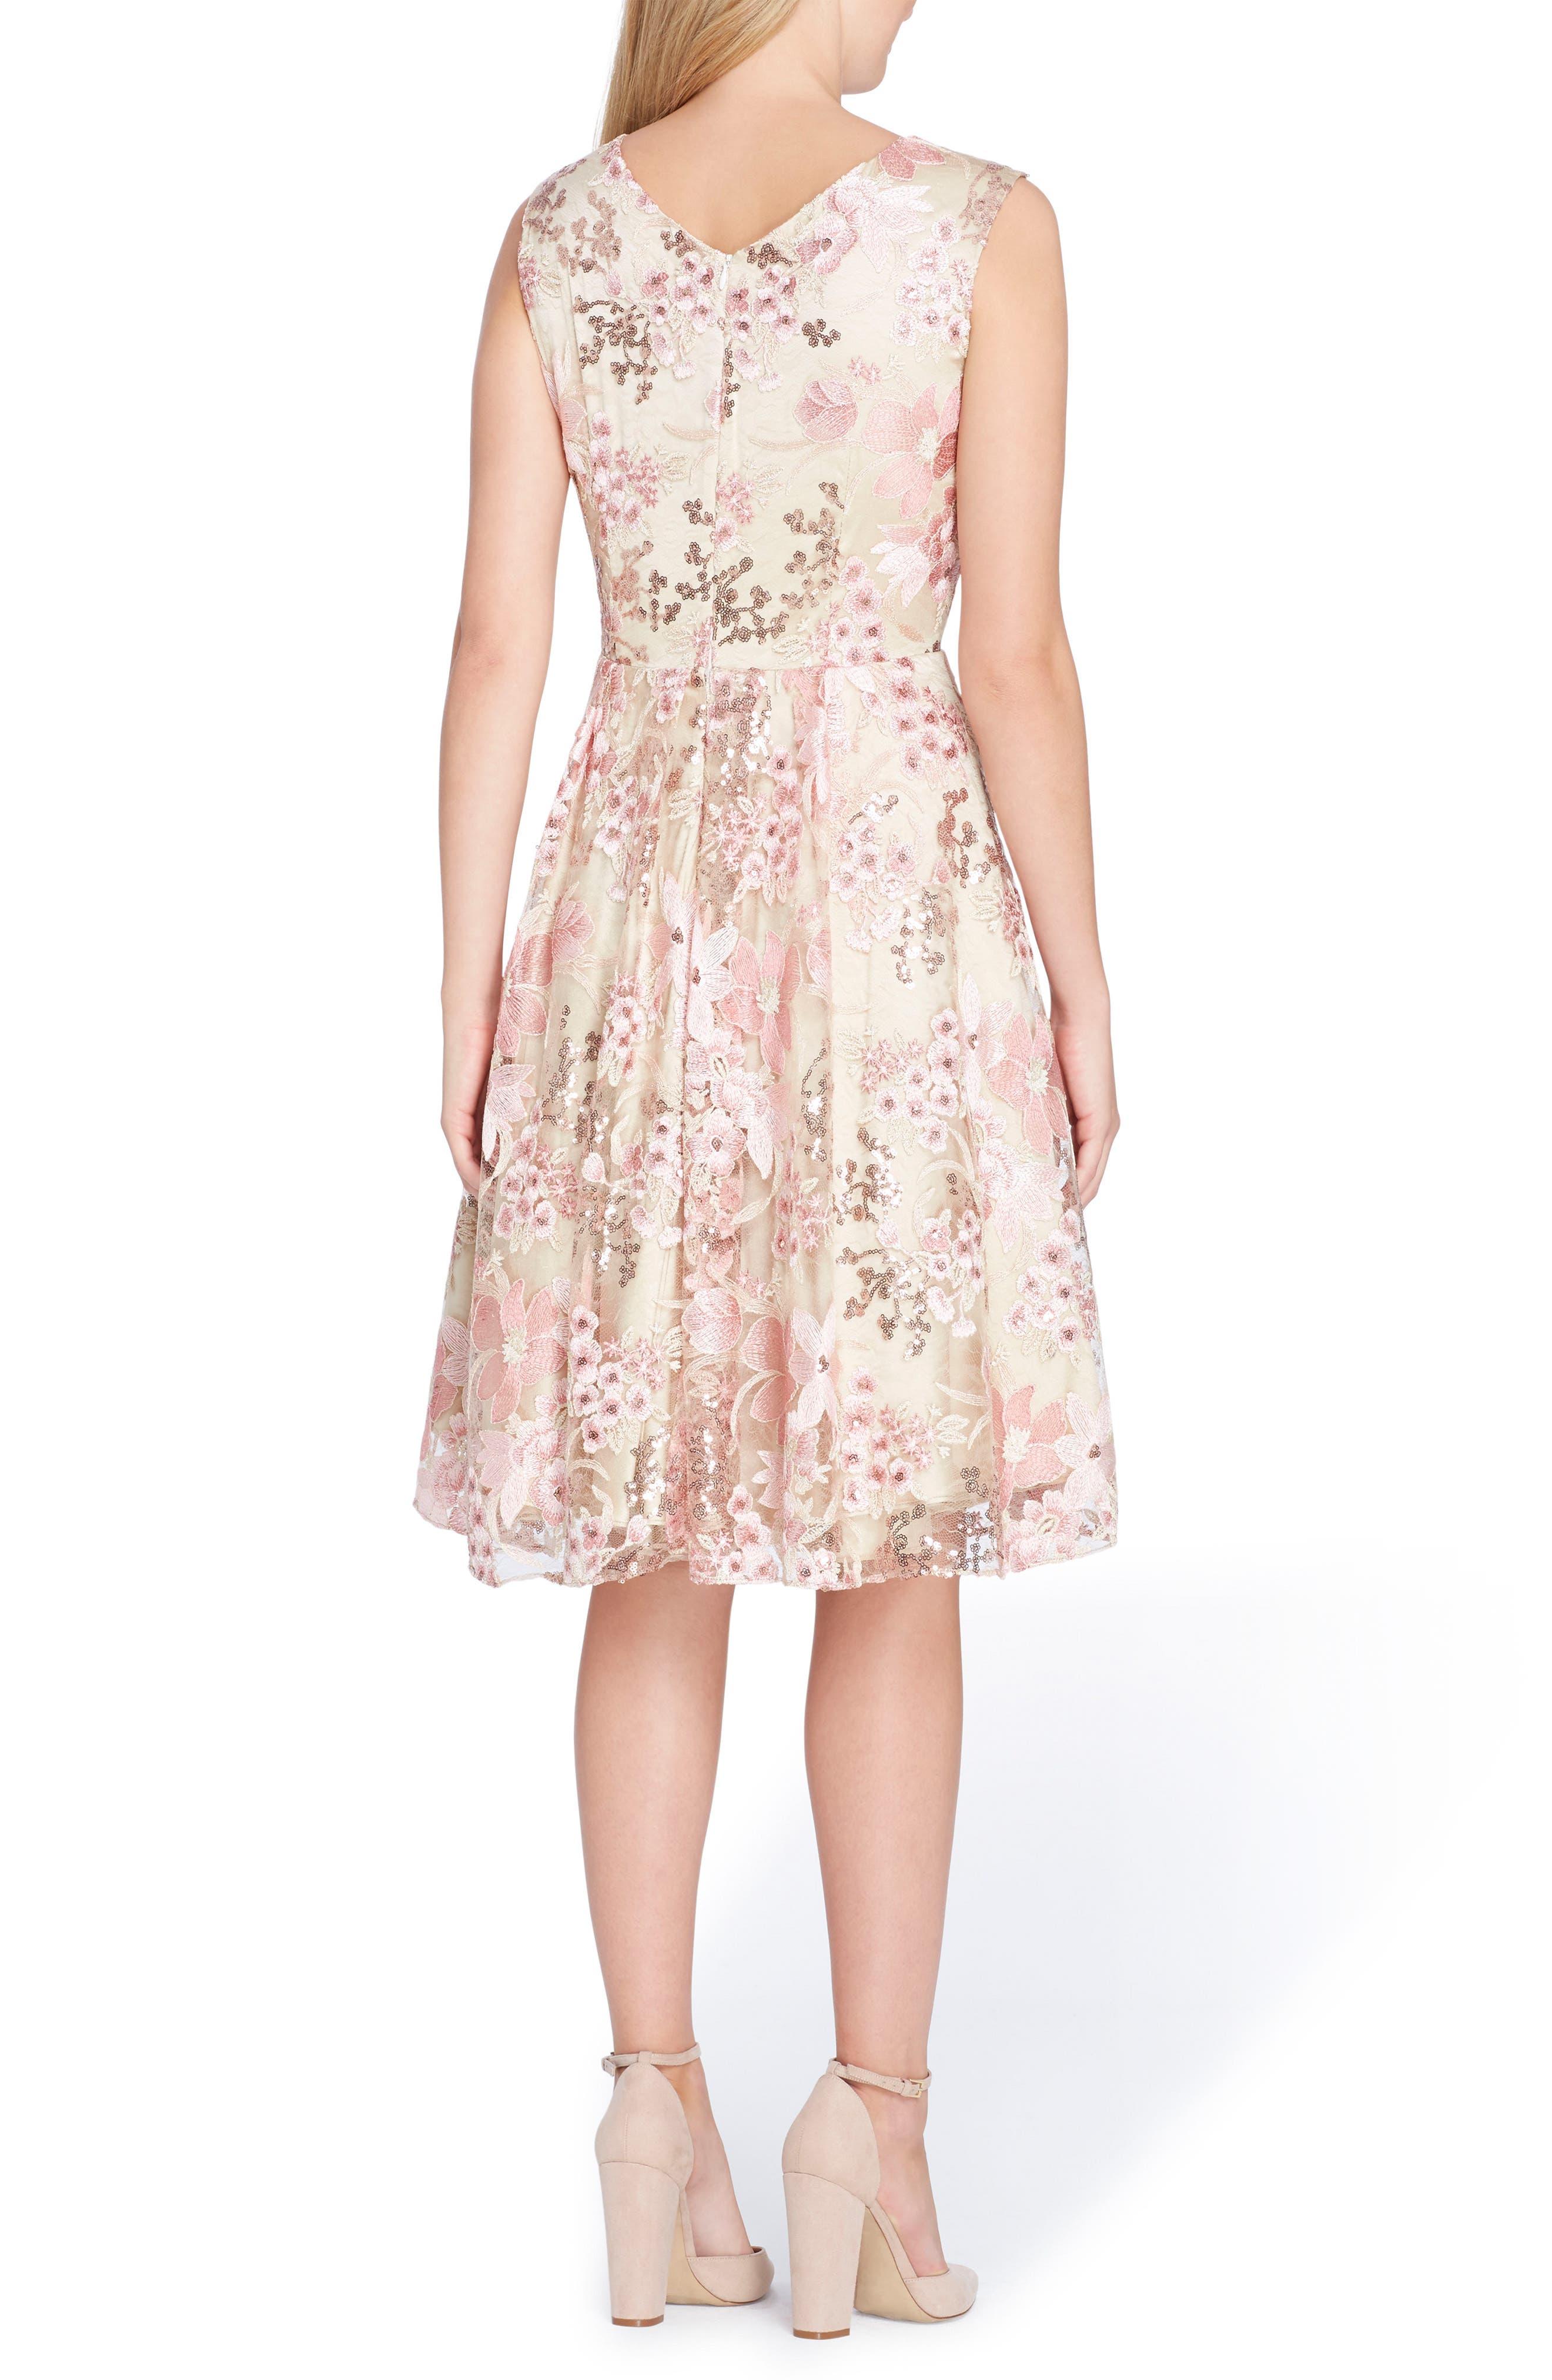 Sleeveless Embroidery Fit & Flare Dress,                             Alternate thumbnail 2, color,                             Nude/ Tea Rose/ Blush